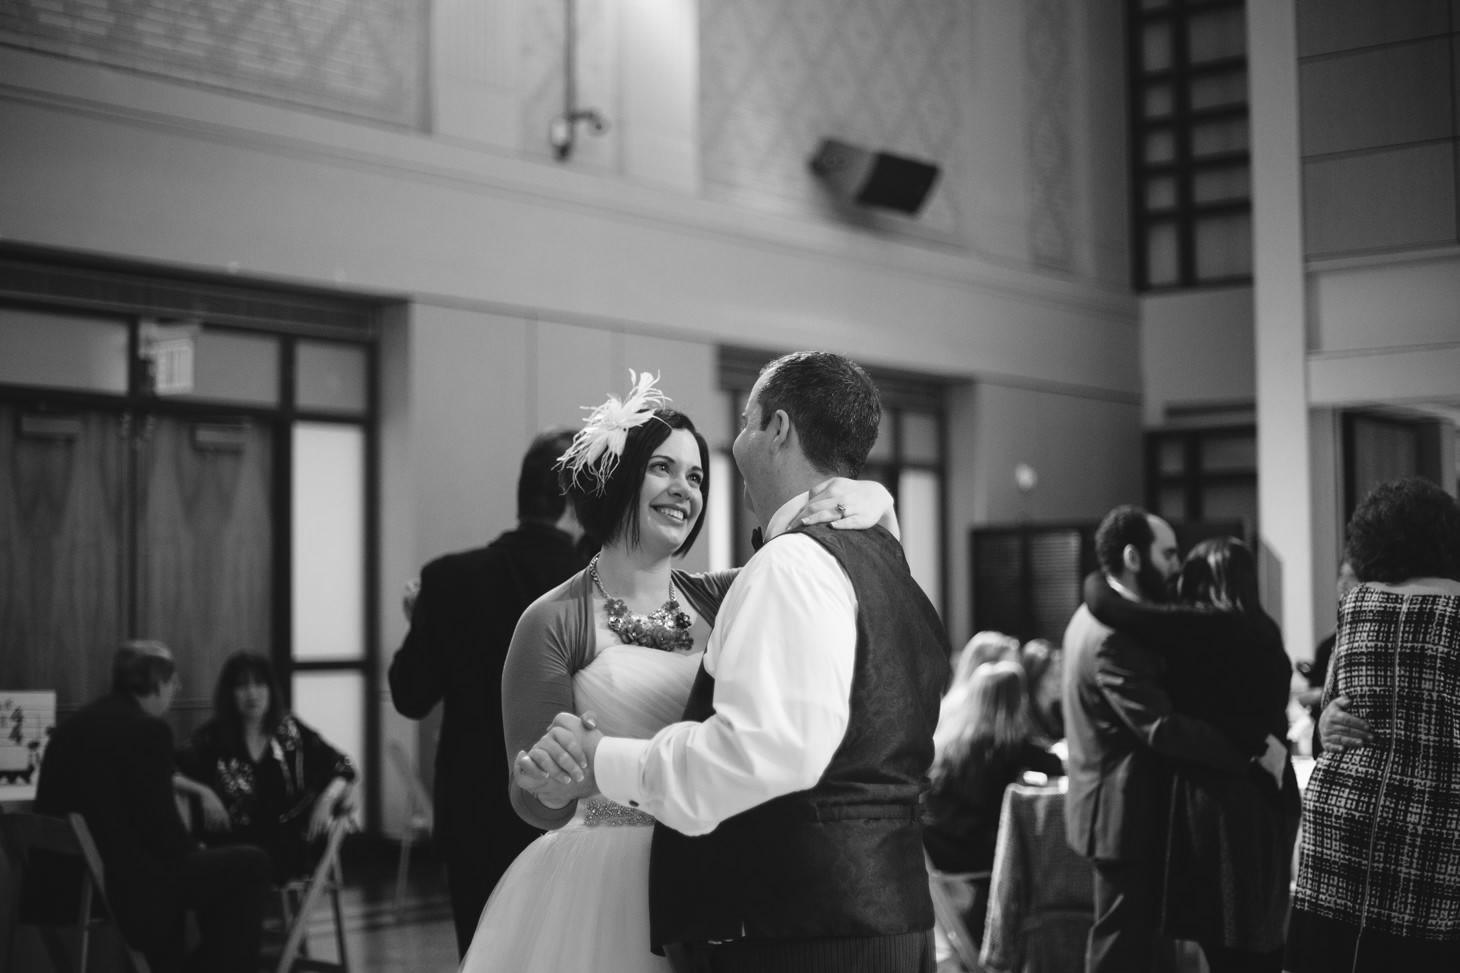 082-nyc-wedding-photographer-smitten-chickens-nj-montclair-art-museum.jpg